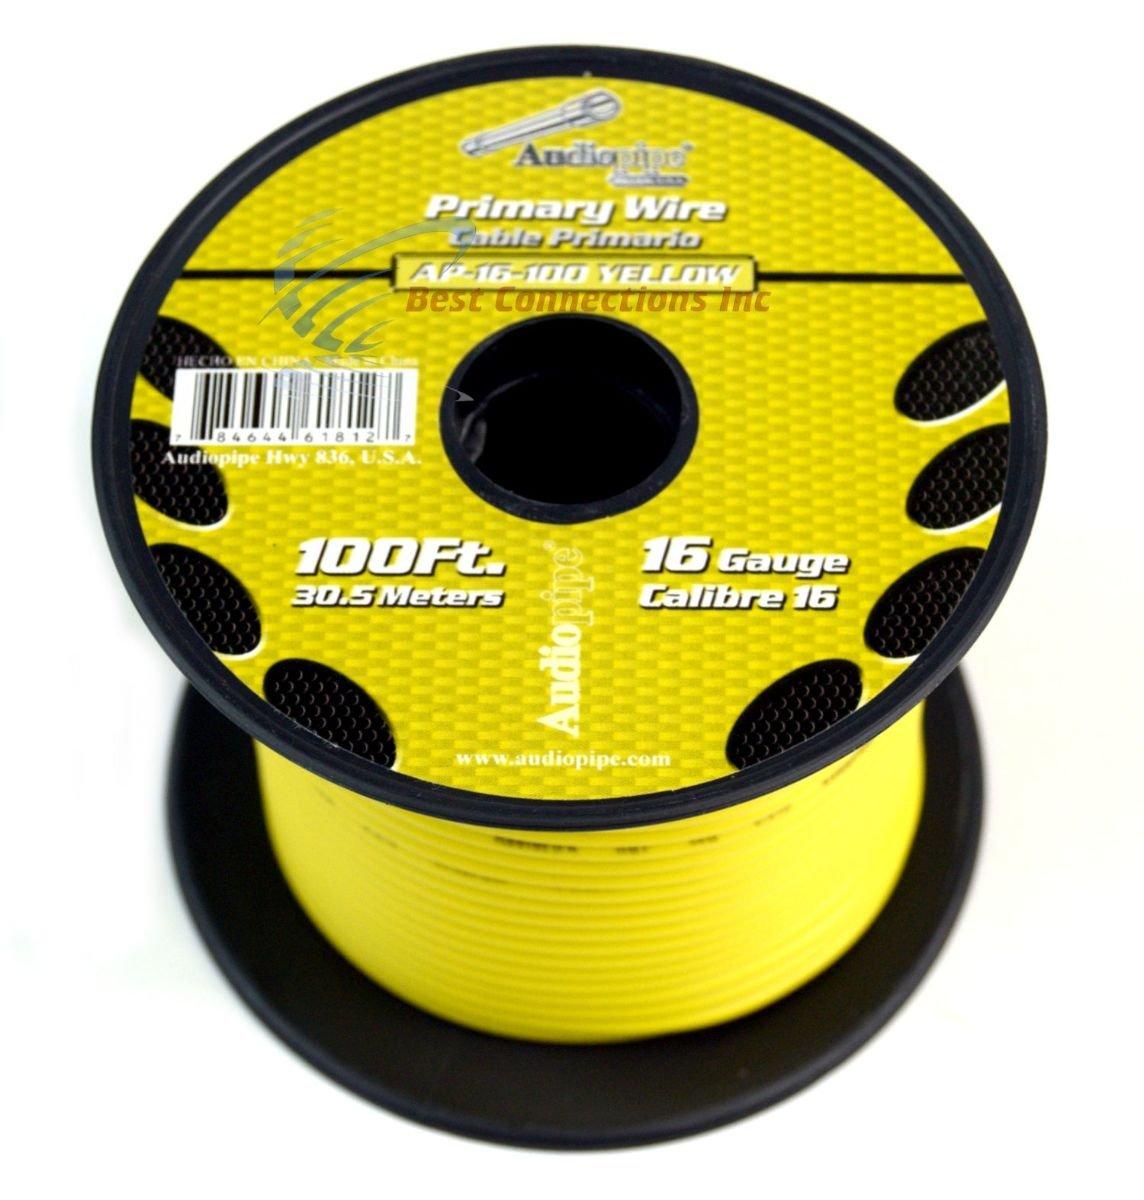 12 GA gauge 100/' Gray Audiopipe Car Audio Home Primary Wire